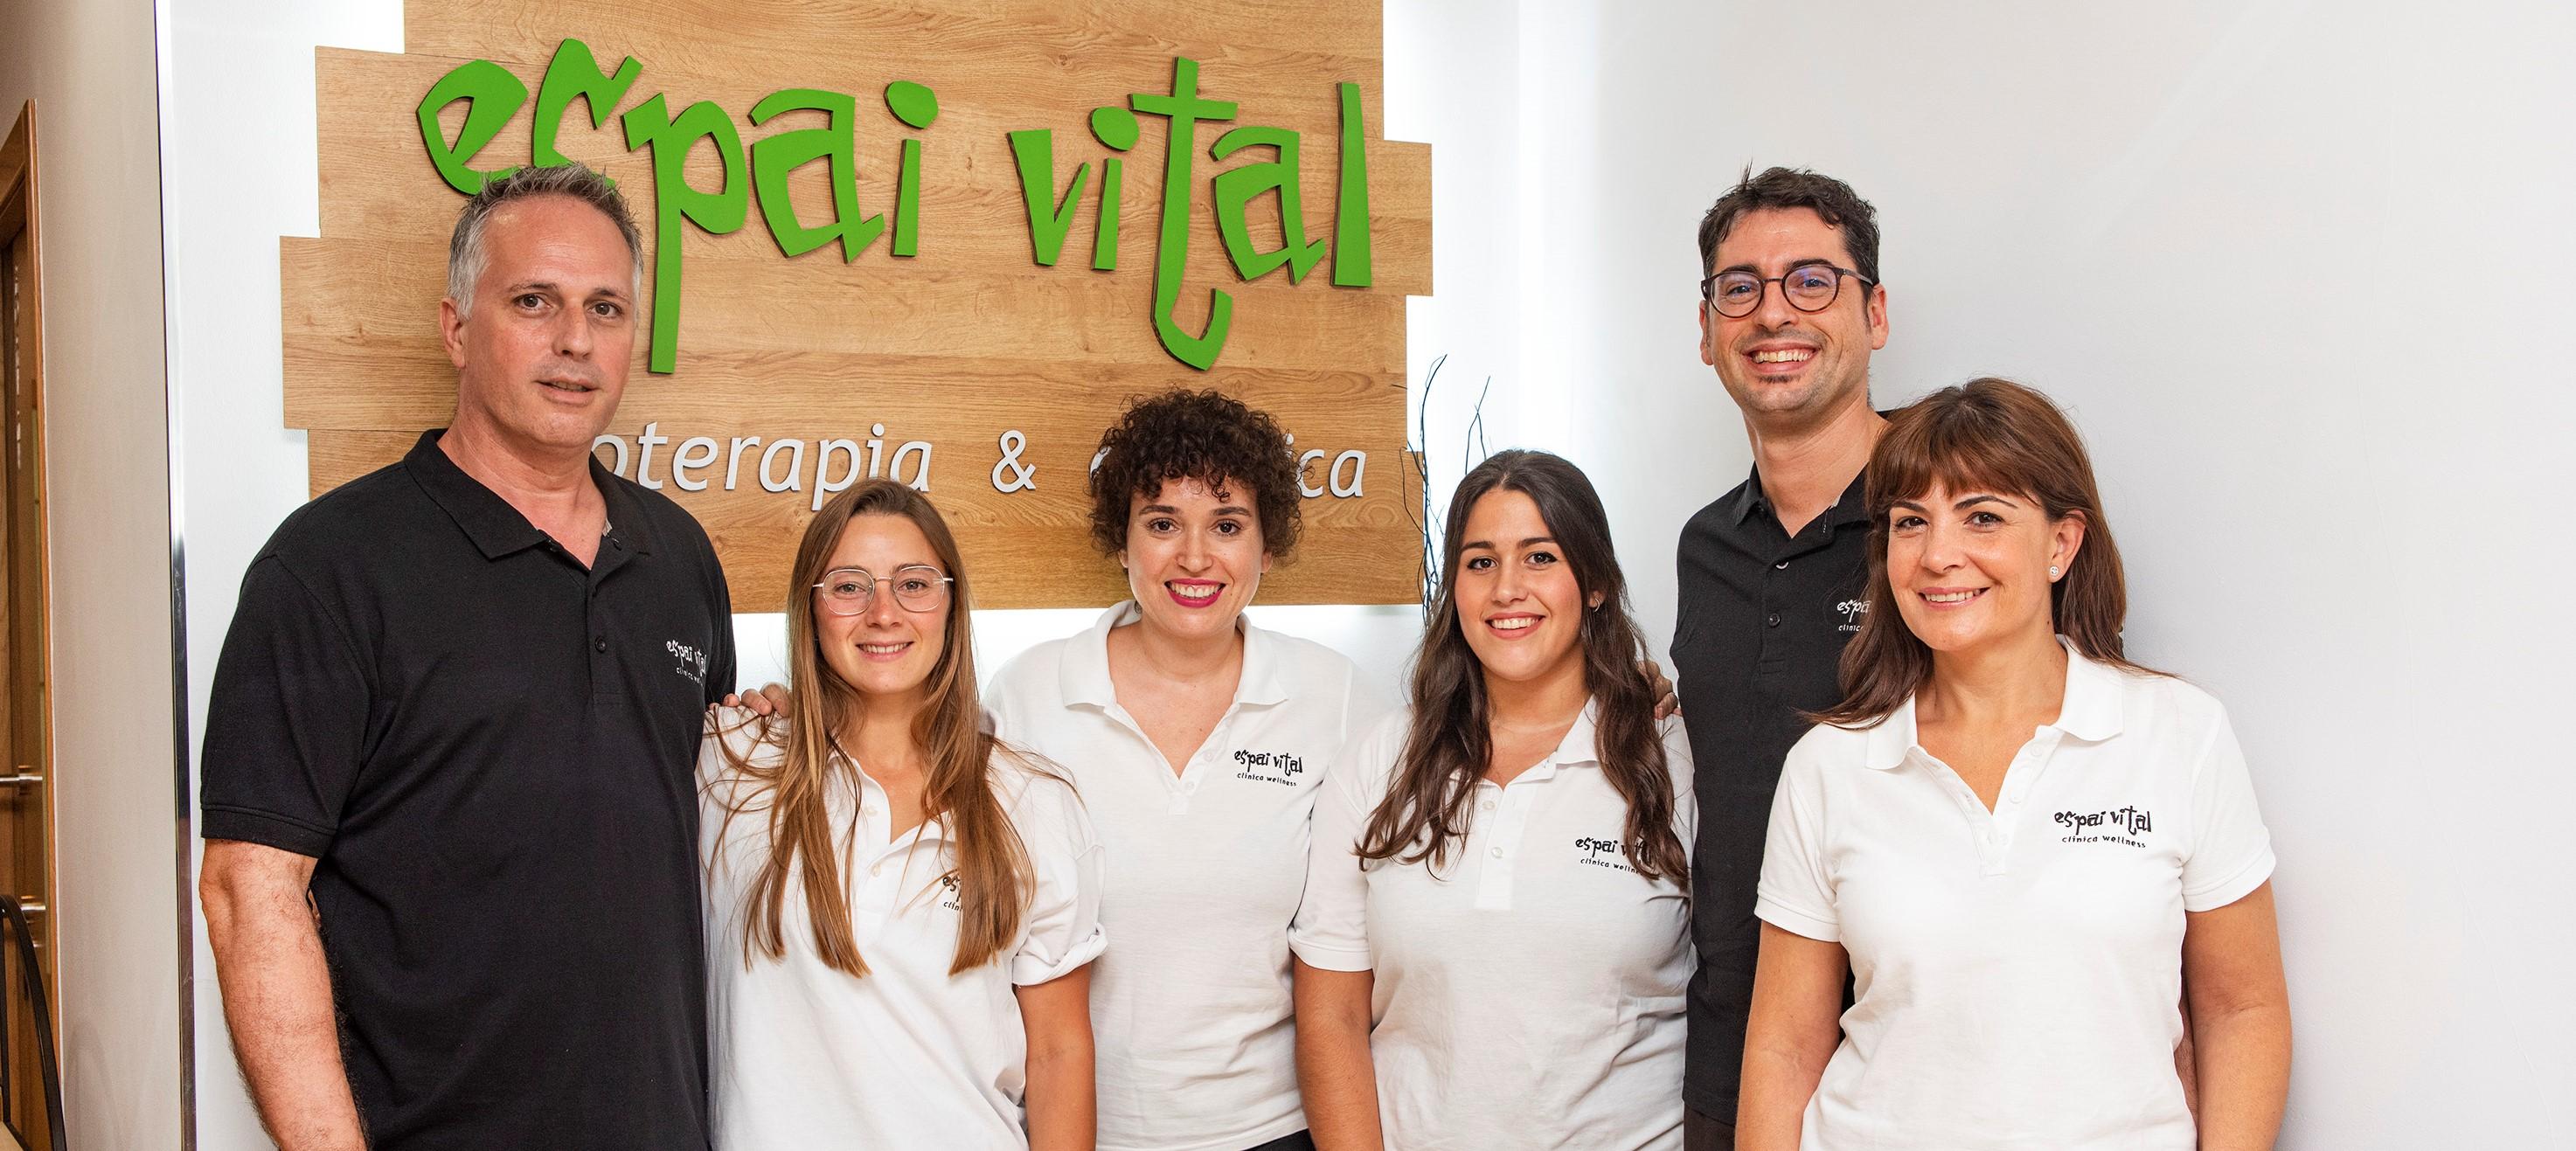 Clínica Espai Vital en Benissa-foto4